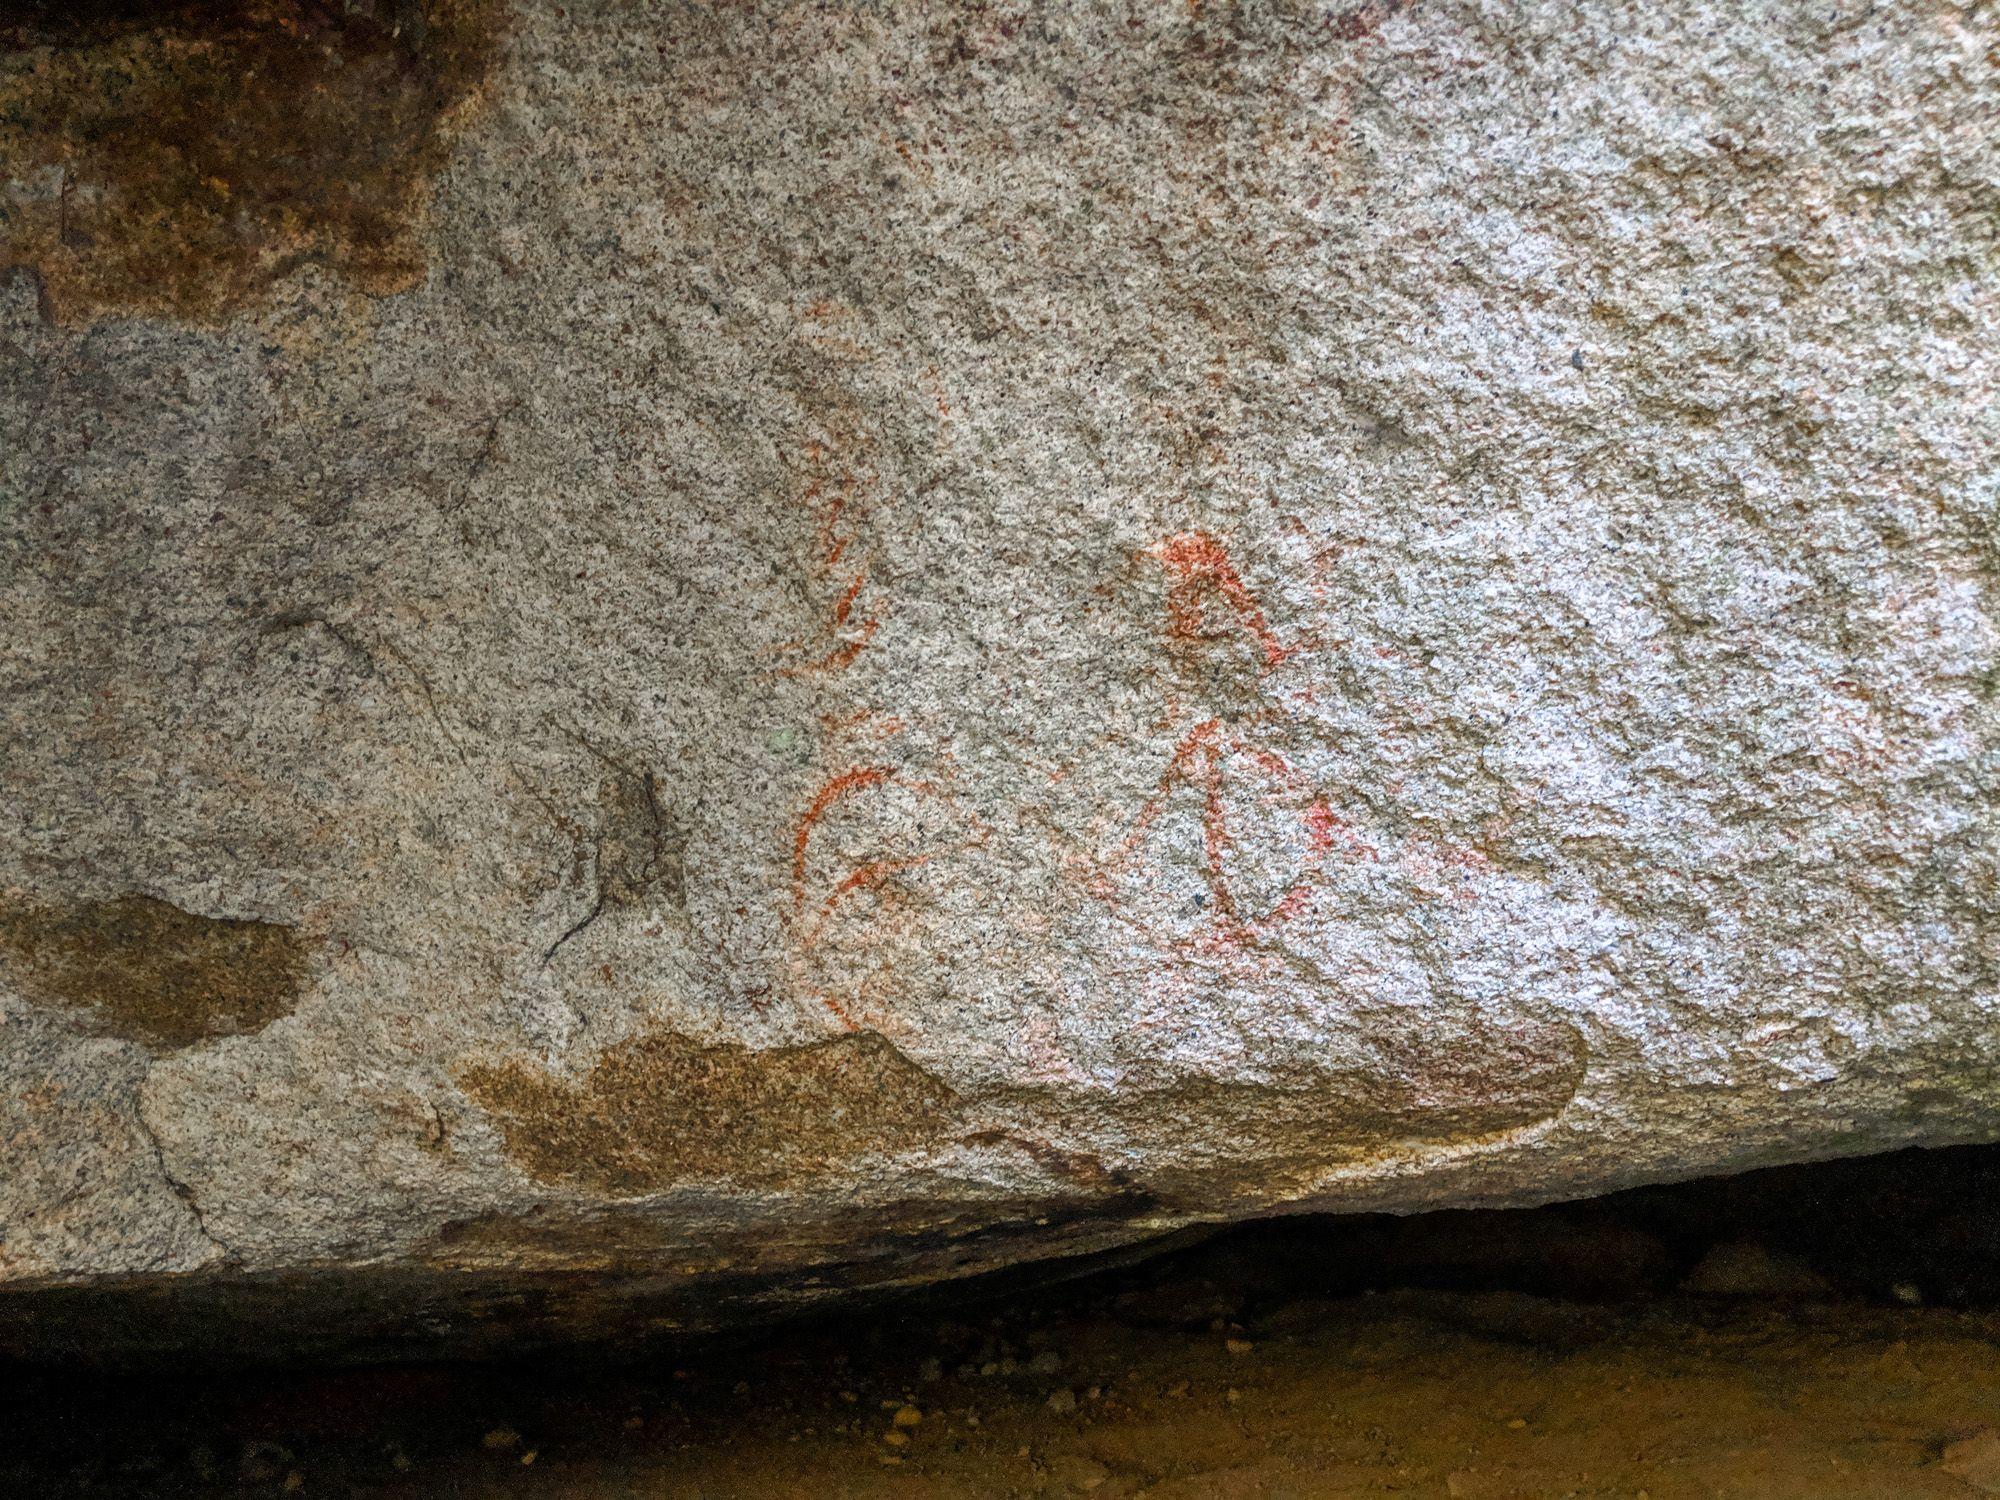 aboriginal rock art ochre paintings bullocky toms track crystal creek paluma